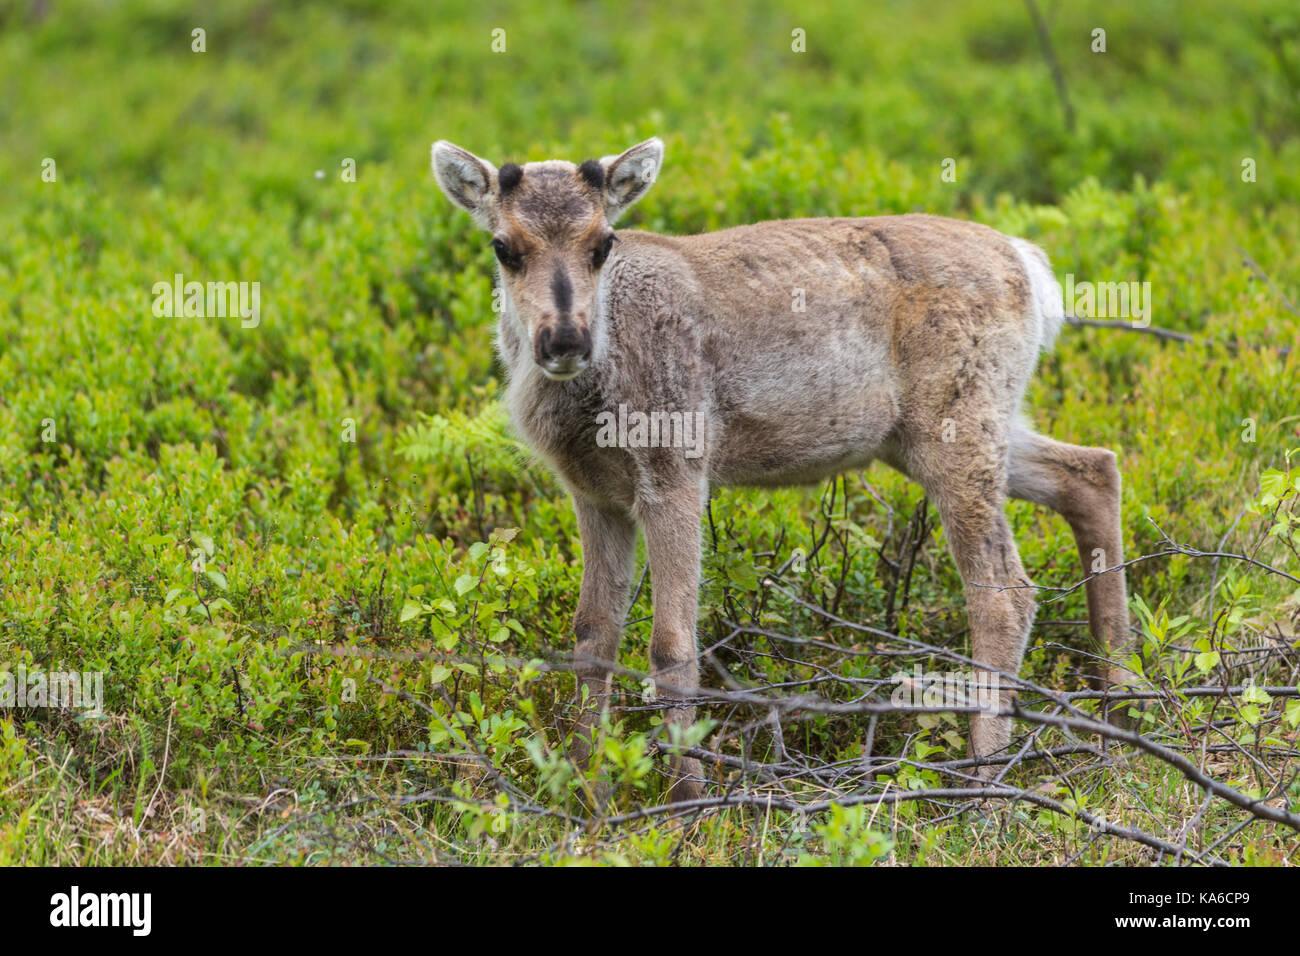 Reindeer calf, Rangifer tarandus, Gällivare, Swedish Lapland, Sweden - Stock Image